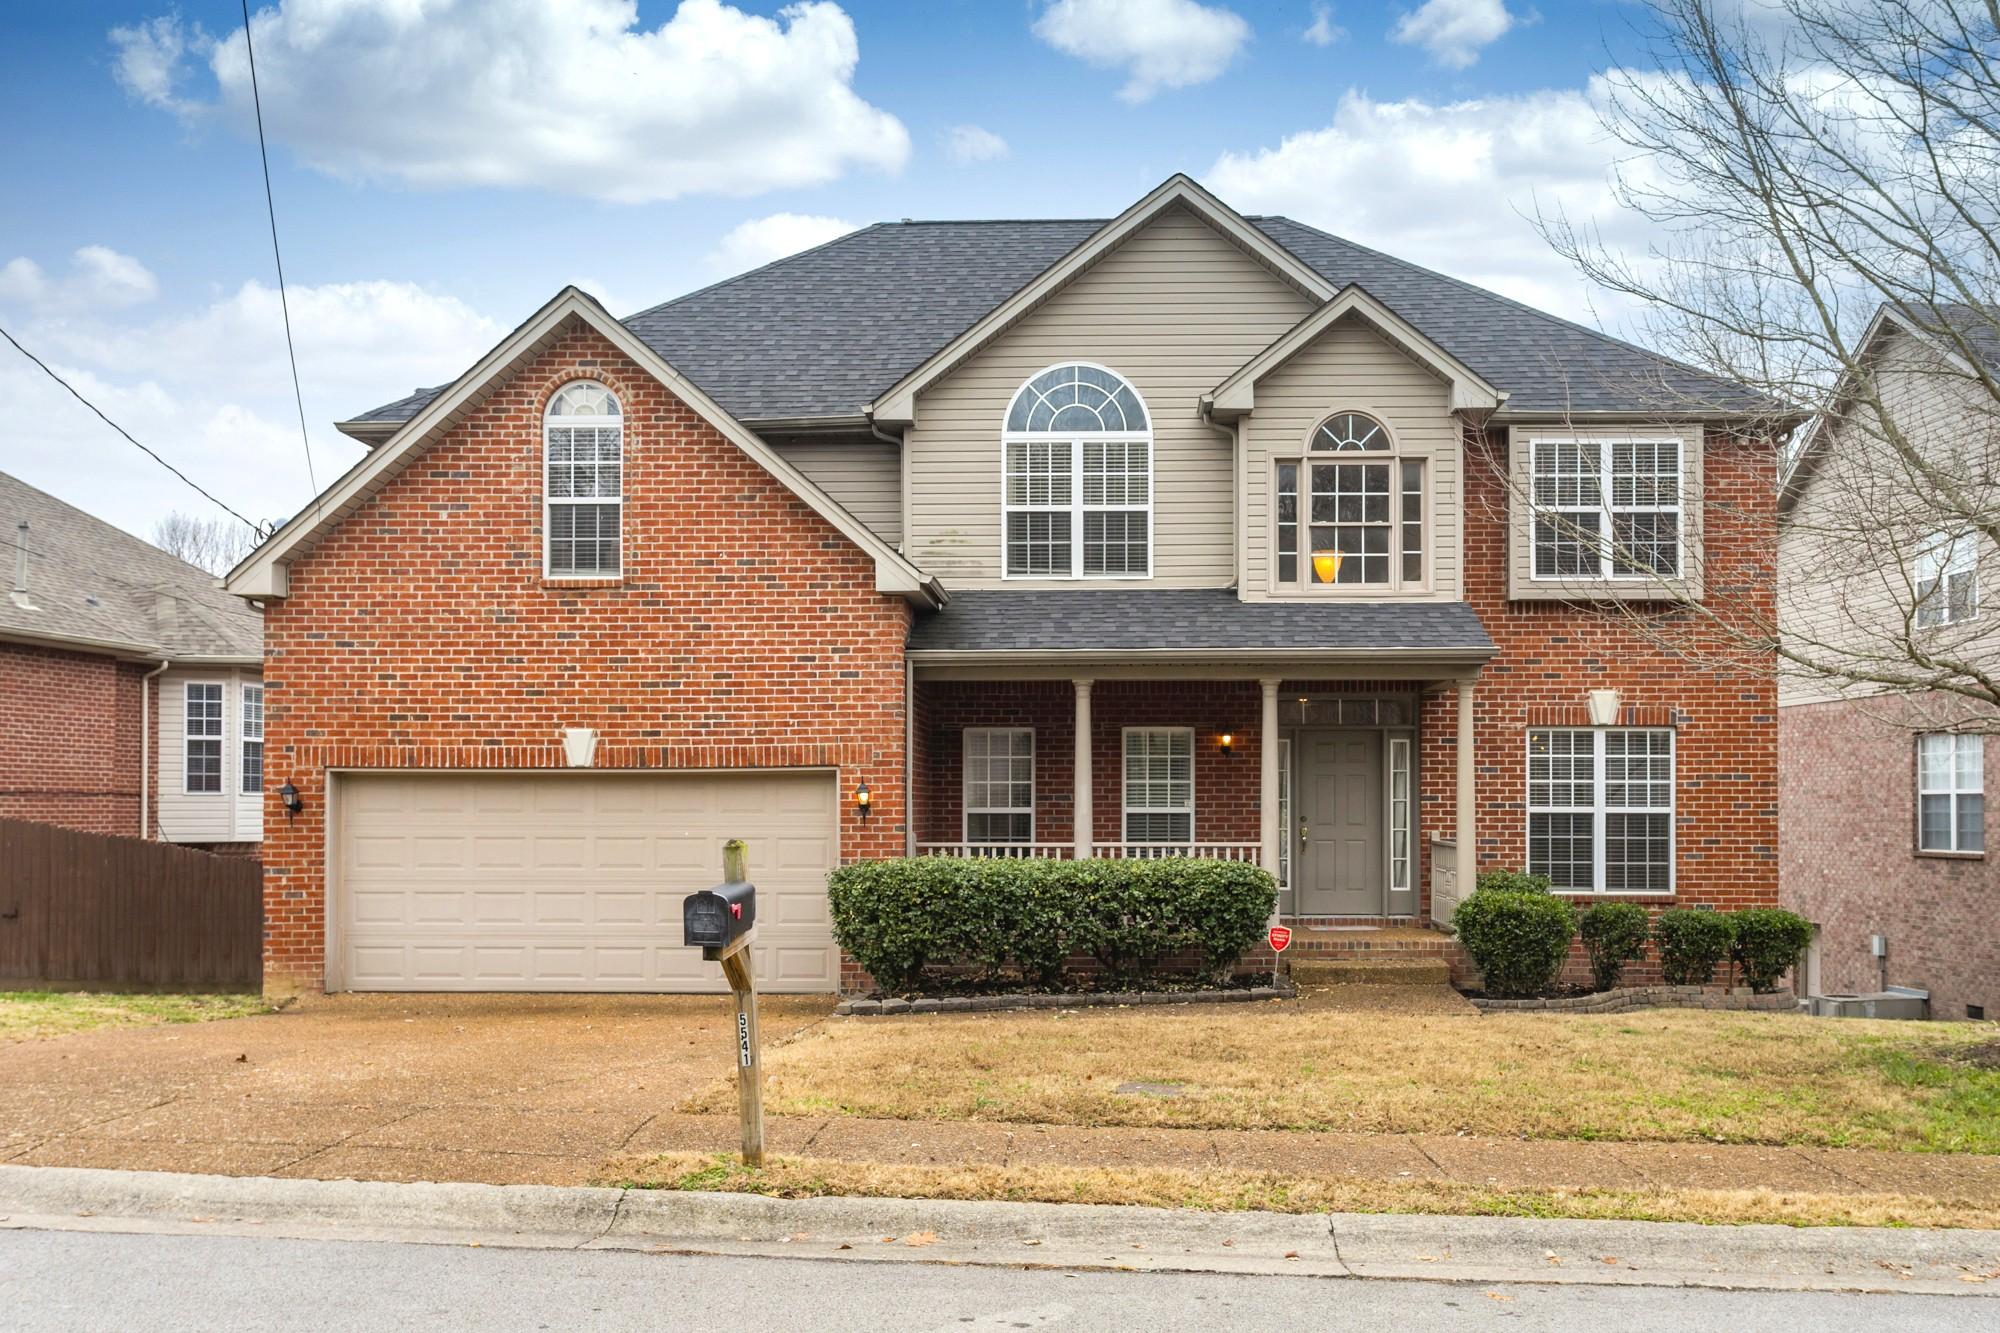 5541 Craftwood Dr, Antioch, TN 37013 - Antioch, TN real estate listing